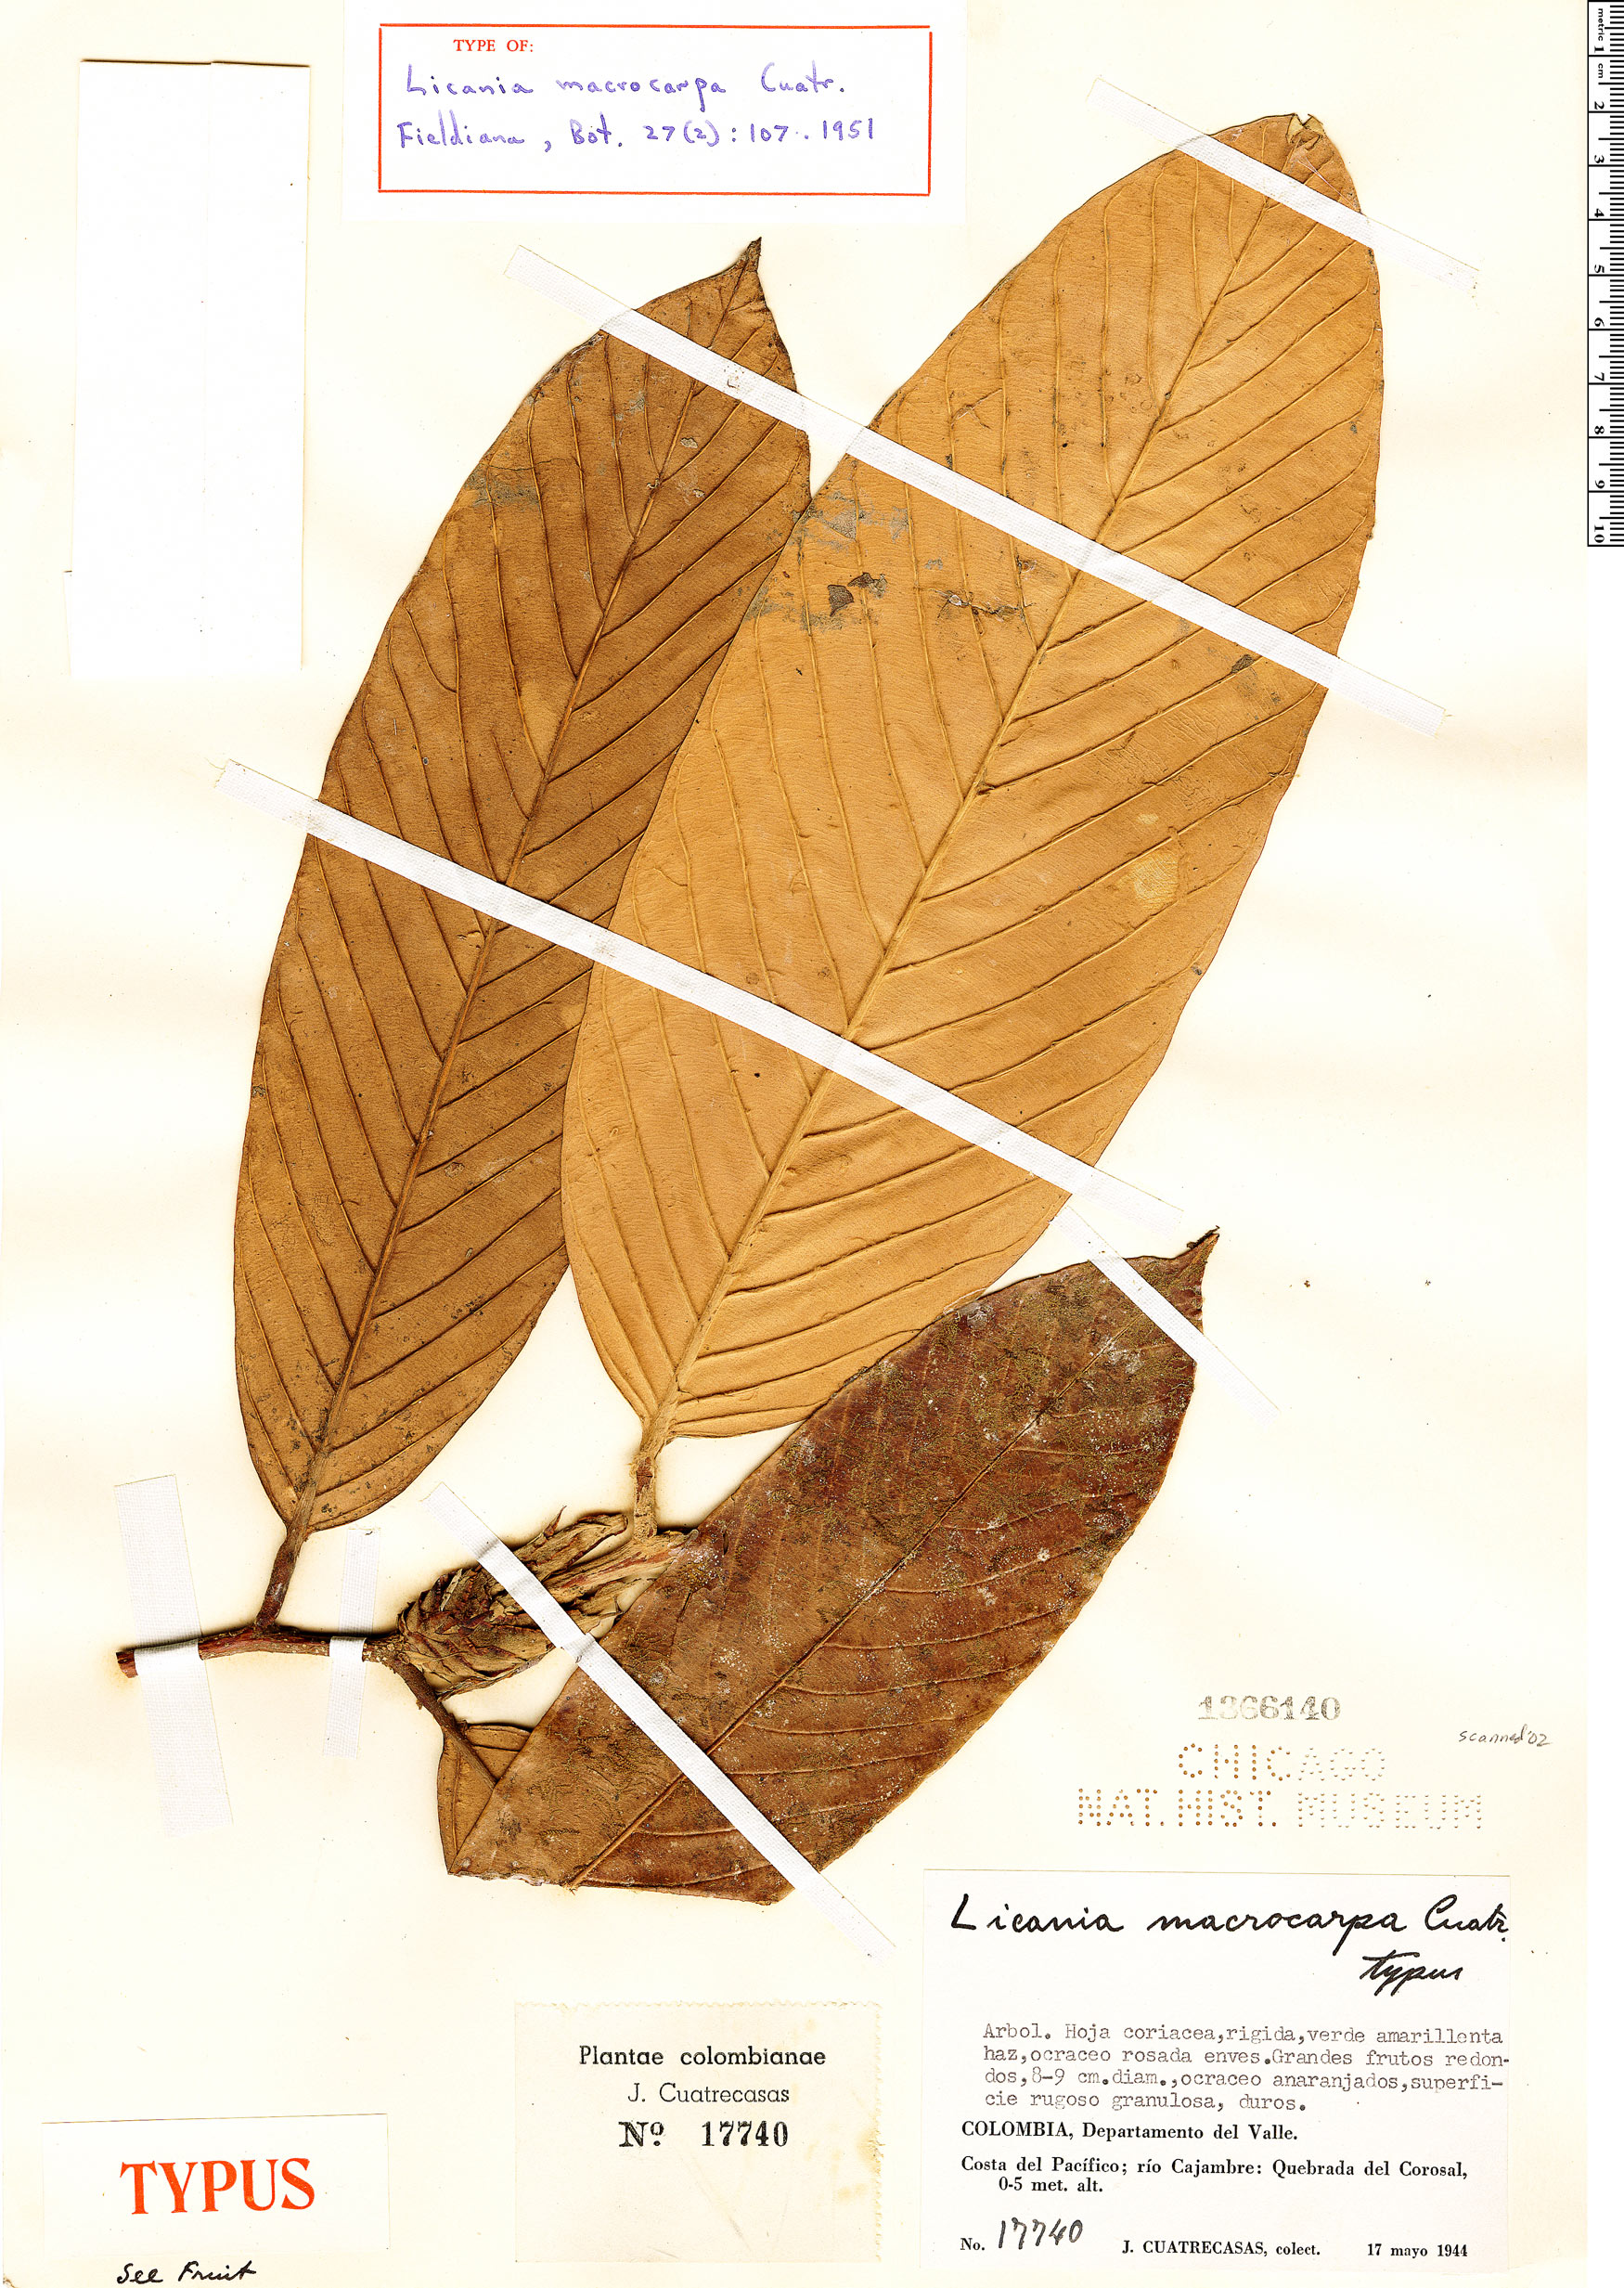 Specimen: Licania macrocarpa